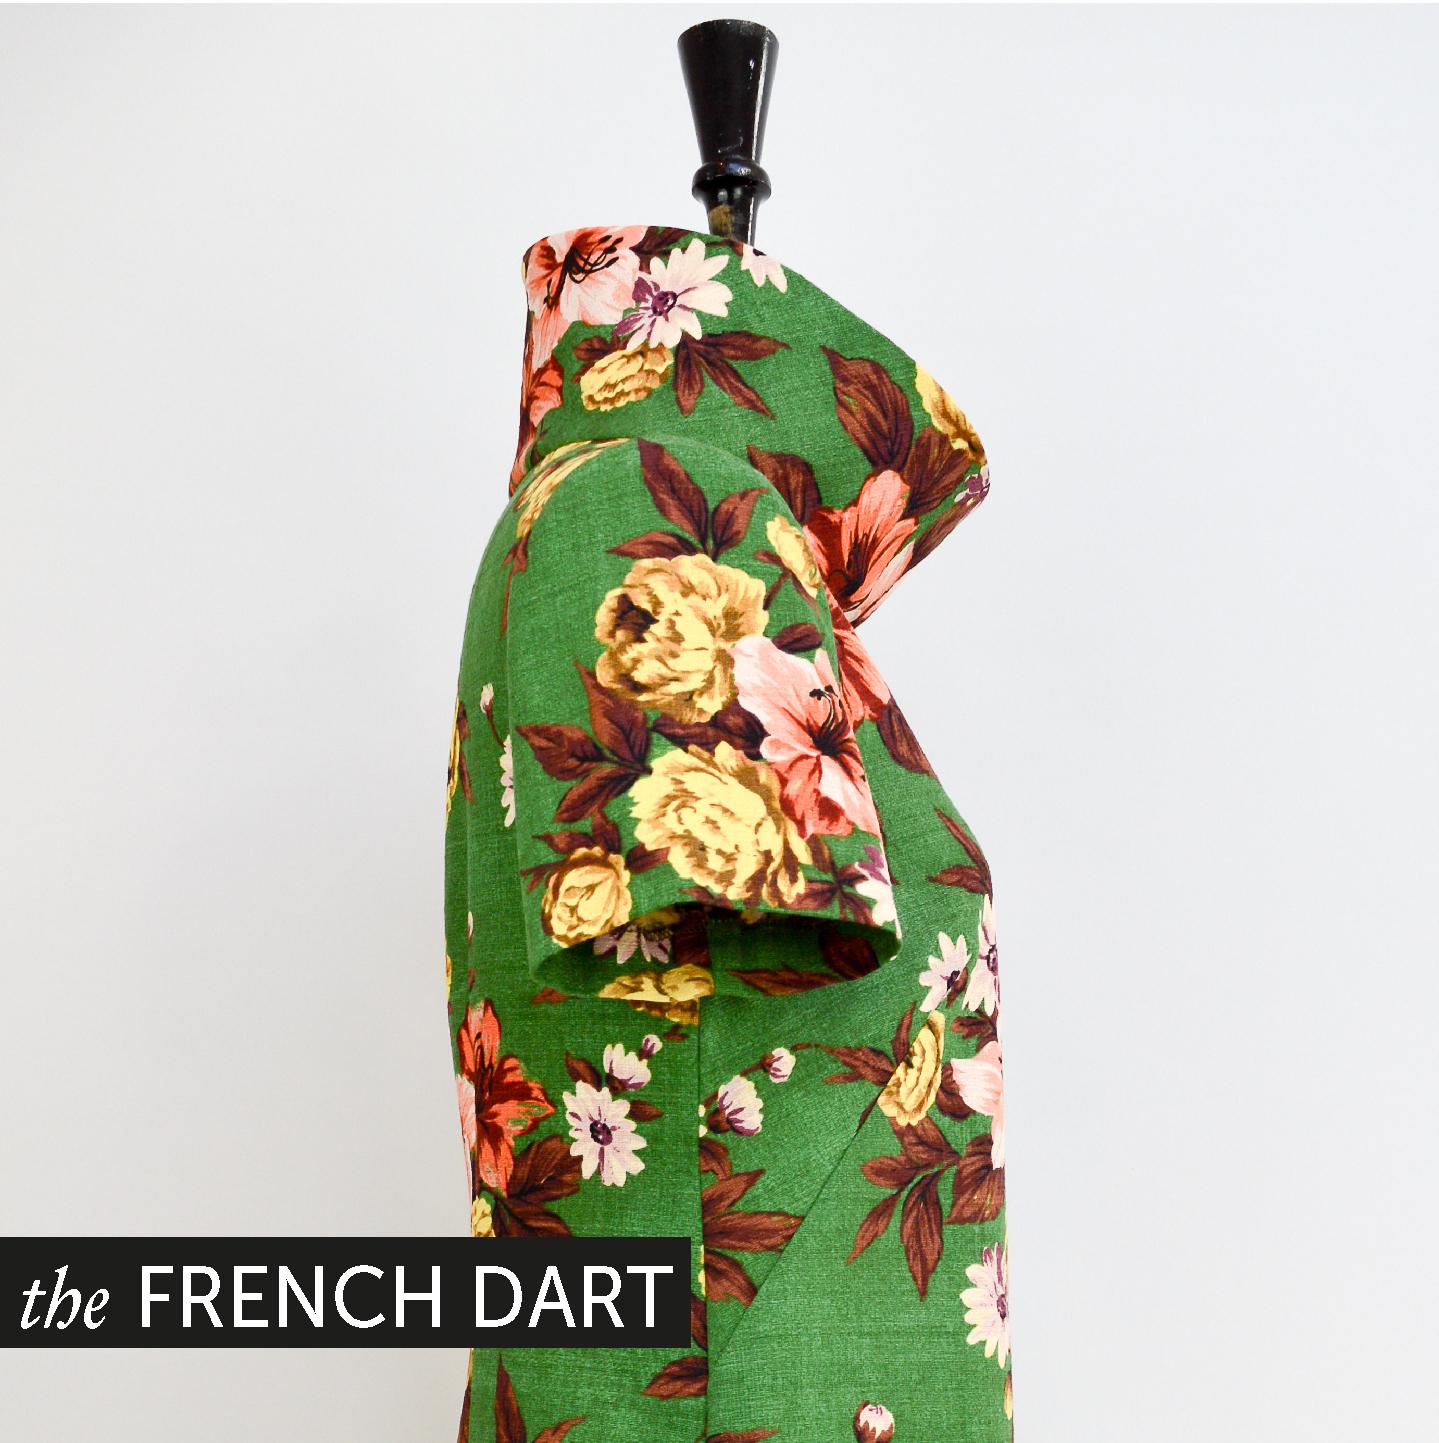 The French Dart - a Maven pattern